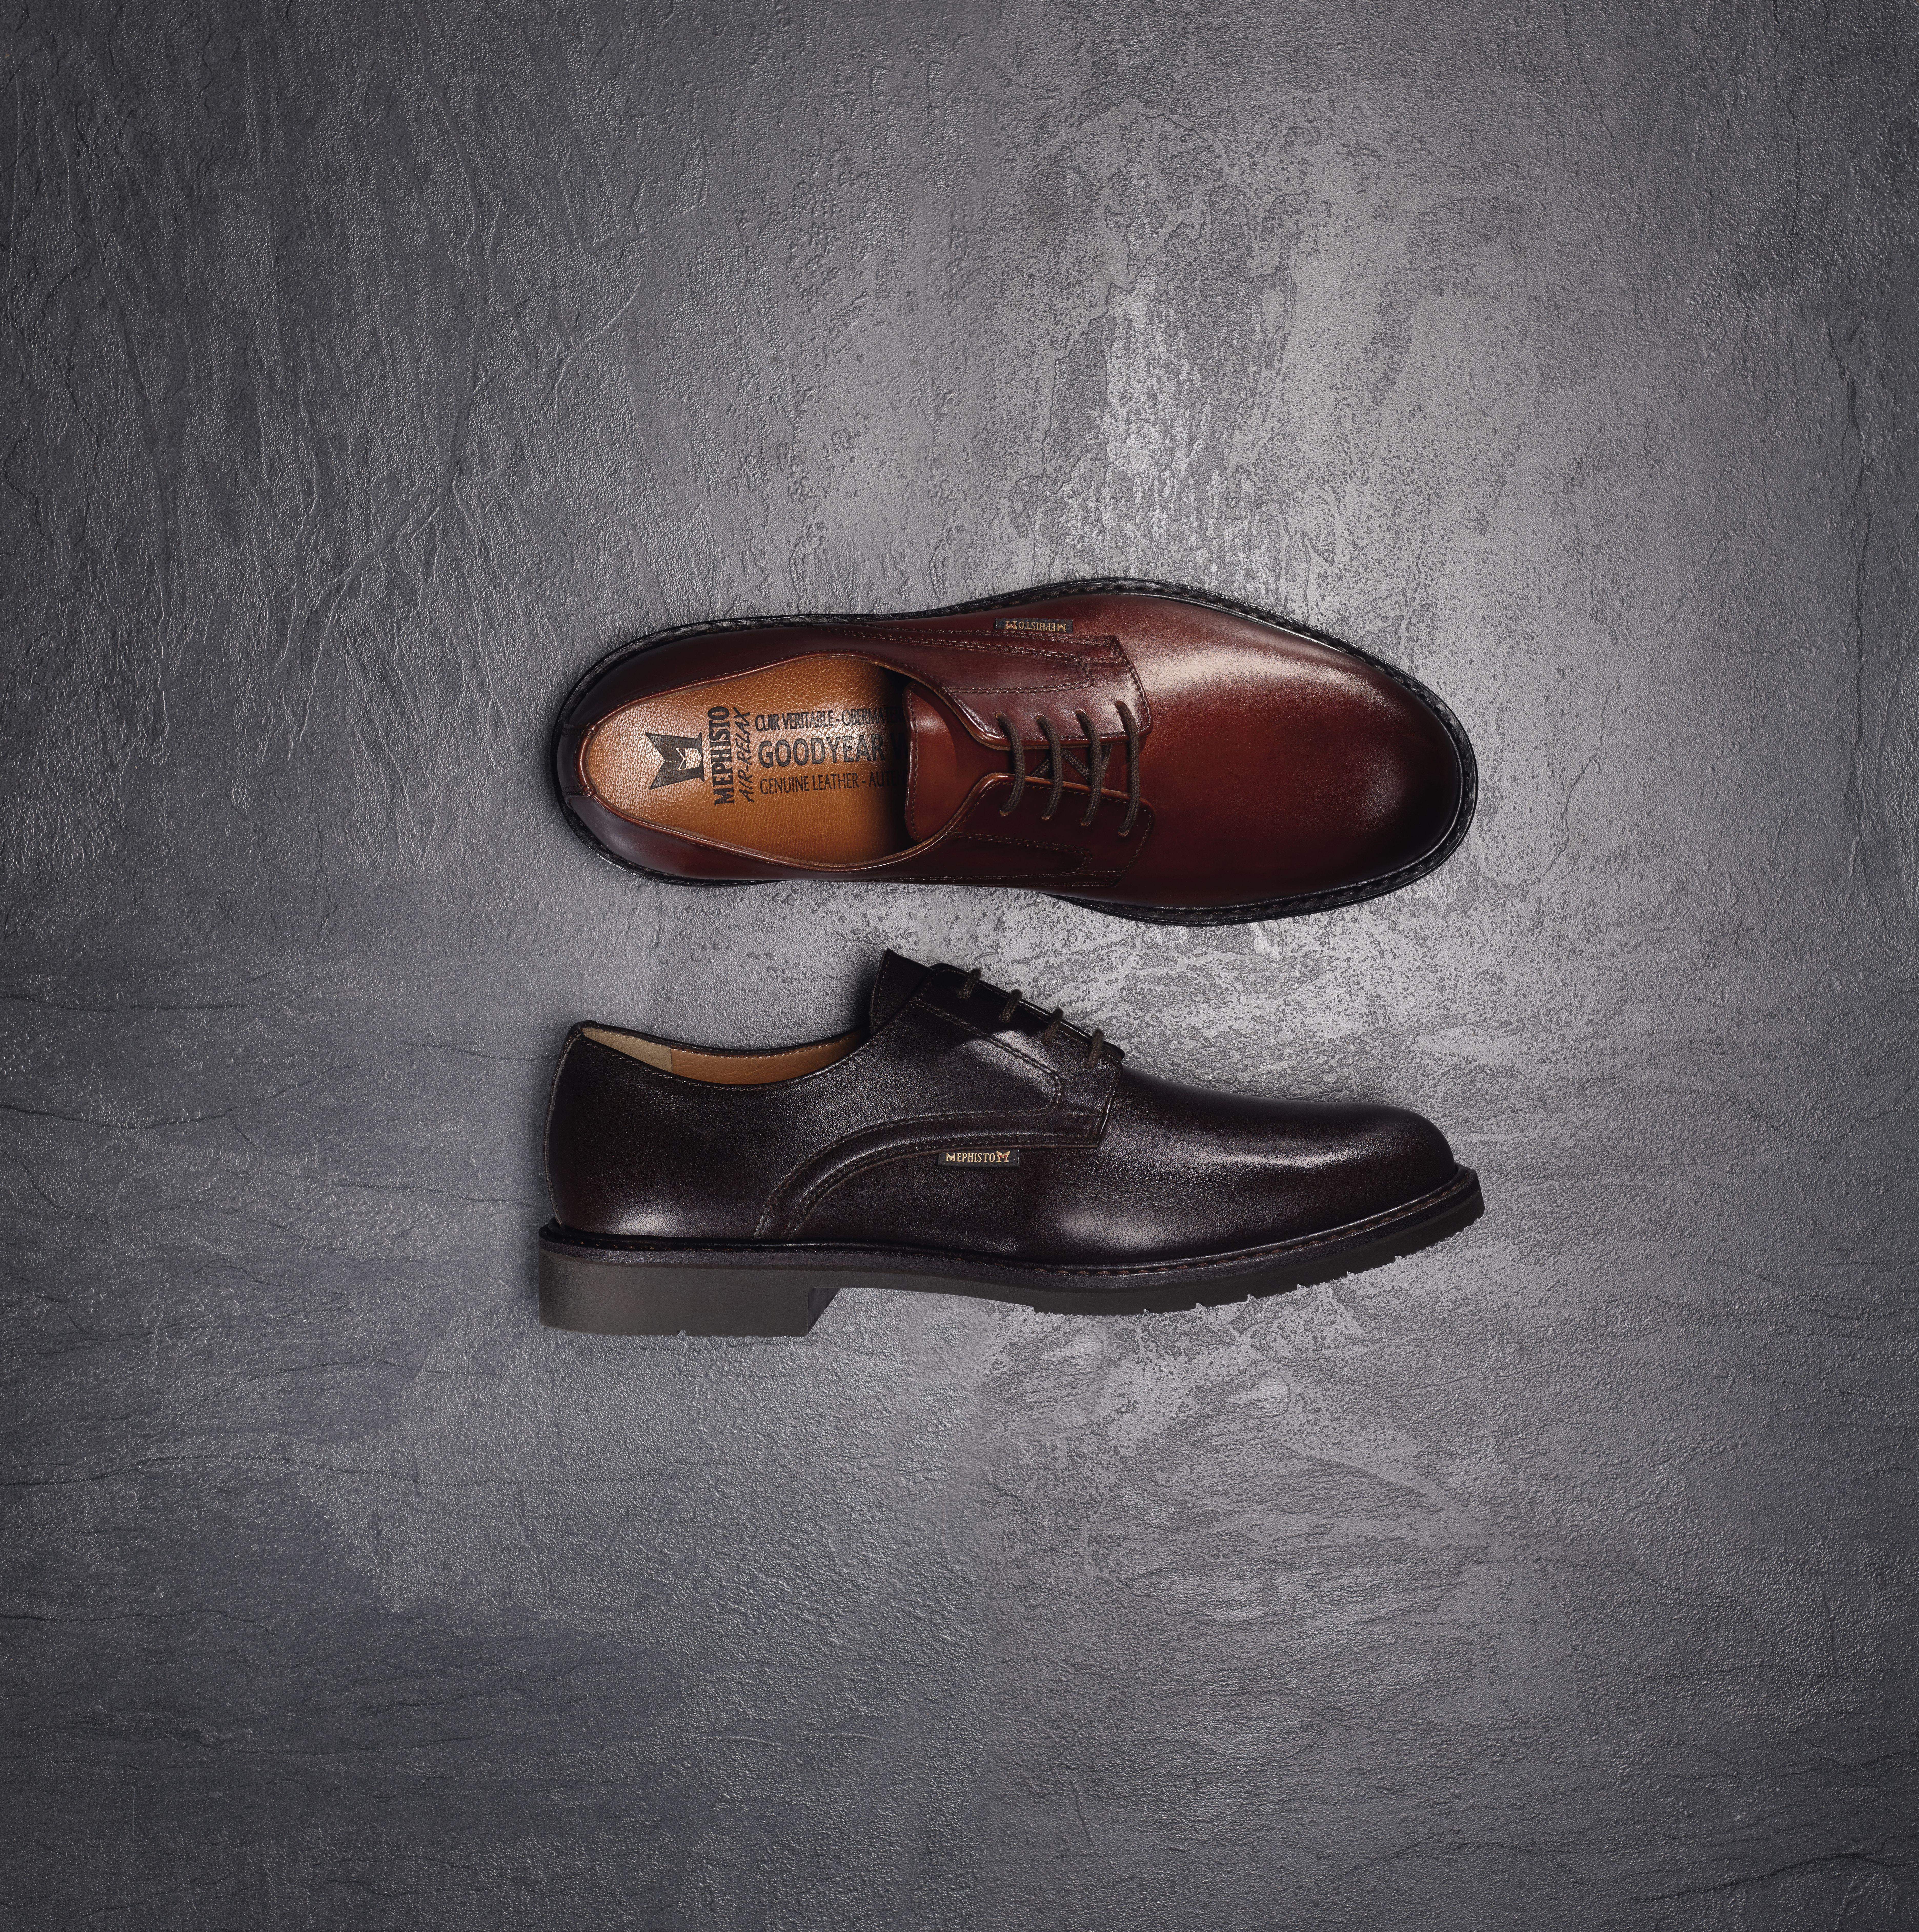 Footwear Construction | MEPHISTO USA